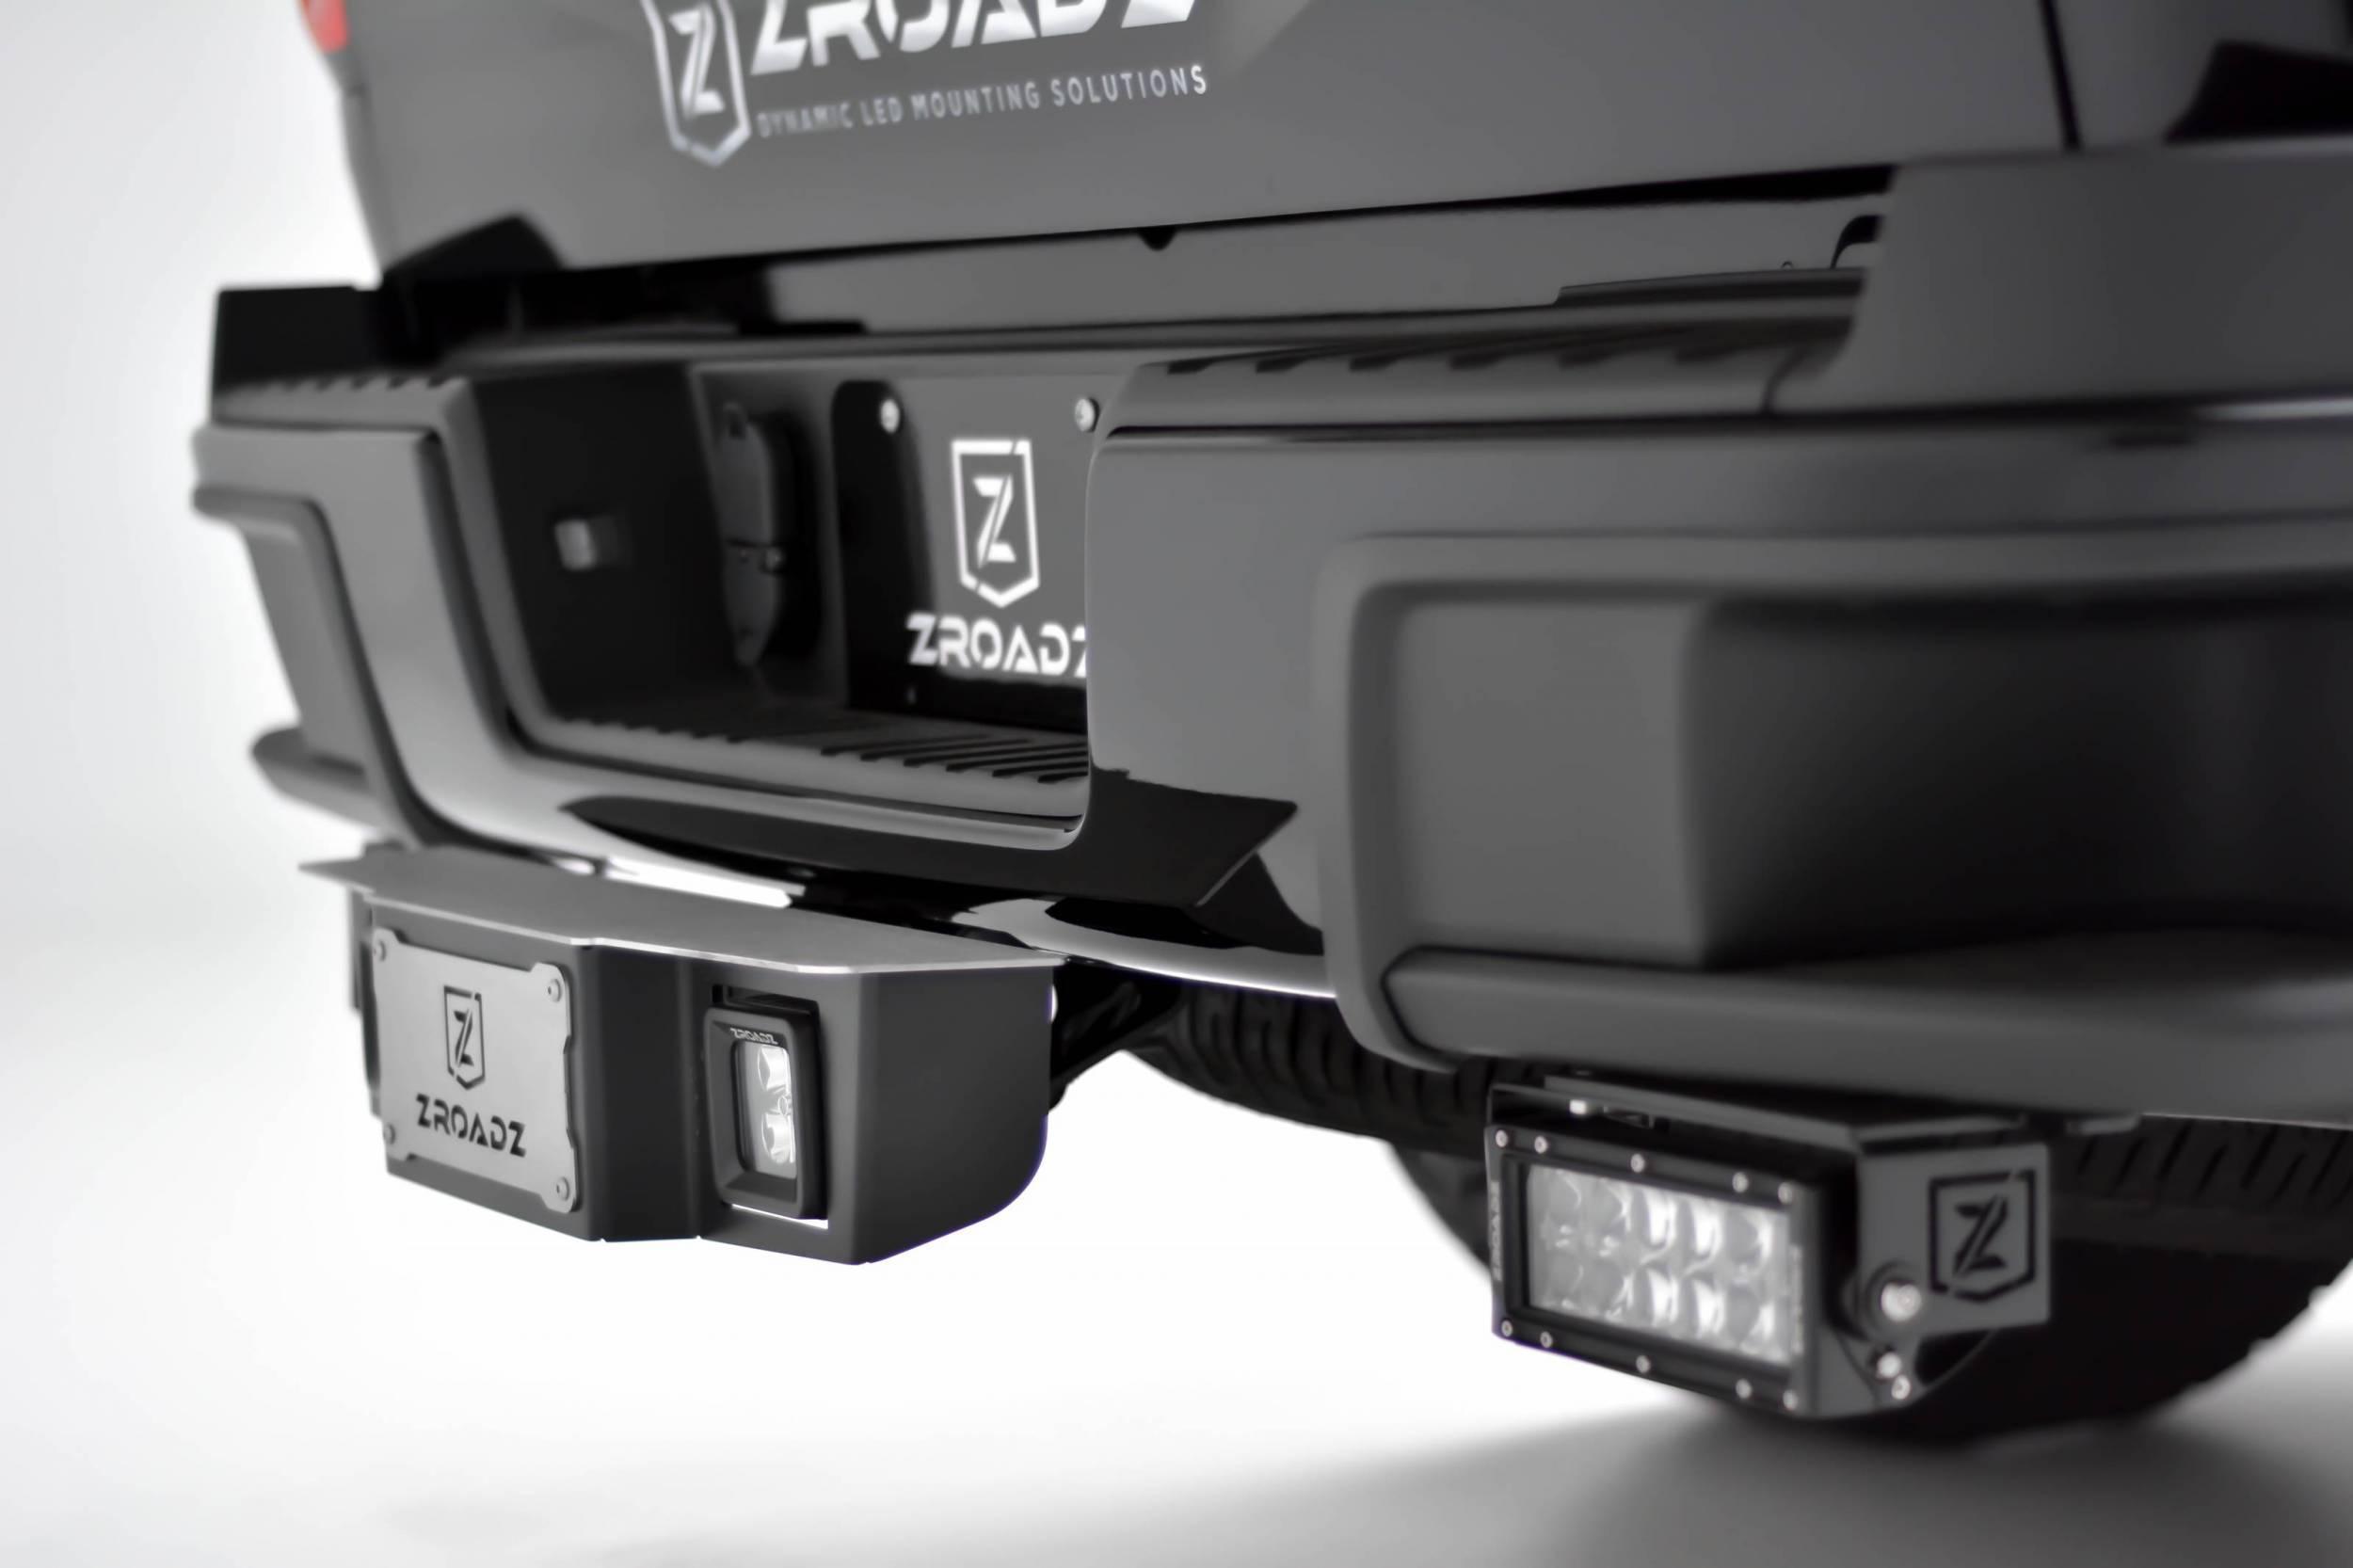 ZROADZ - Universal Hitch Step LED Kit with (2) 3 Inch LED Pod Lights, Fits 2,5 Inch Receiver - PN #Z390011-KIT